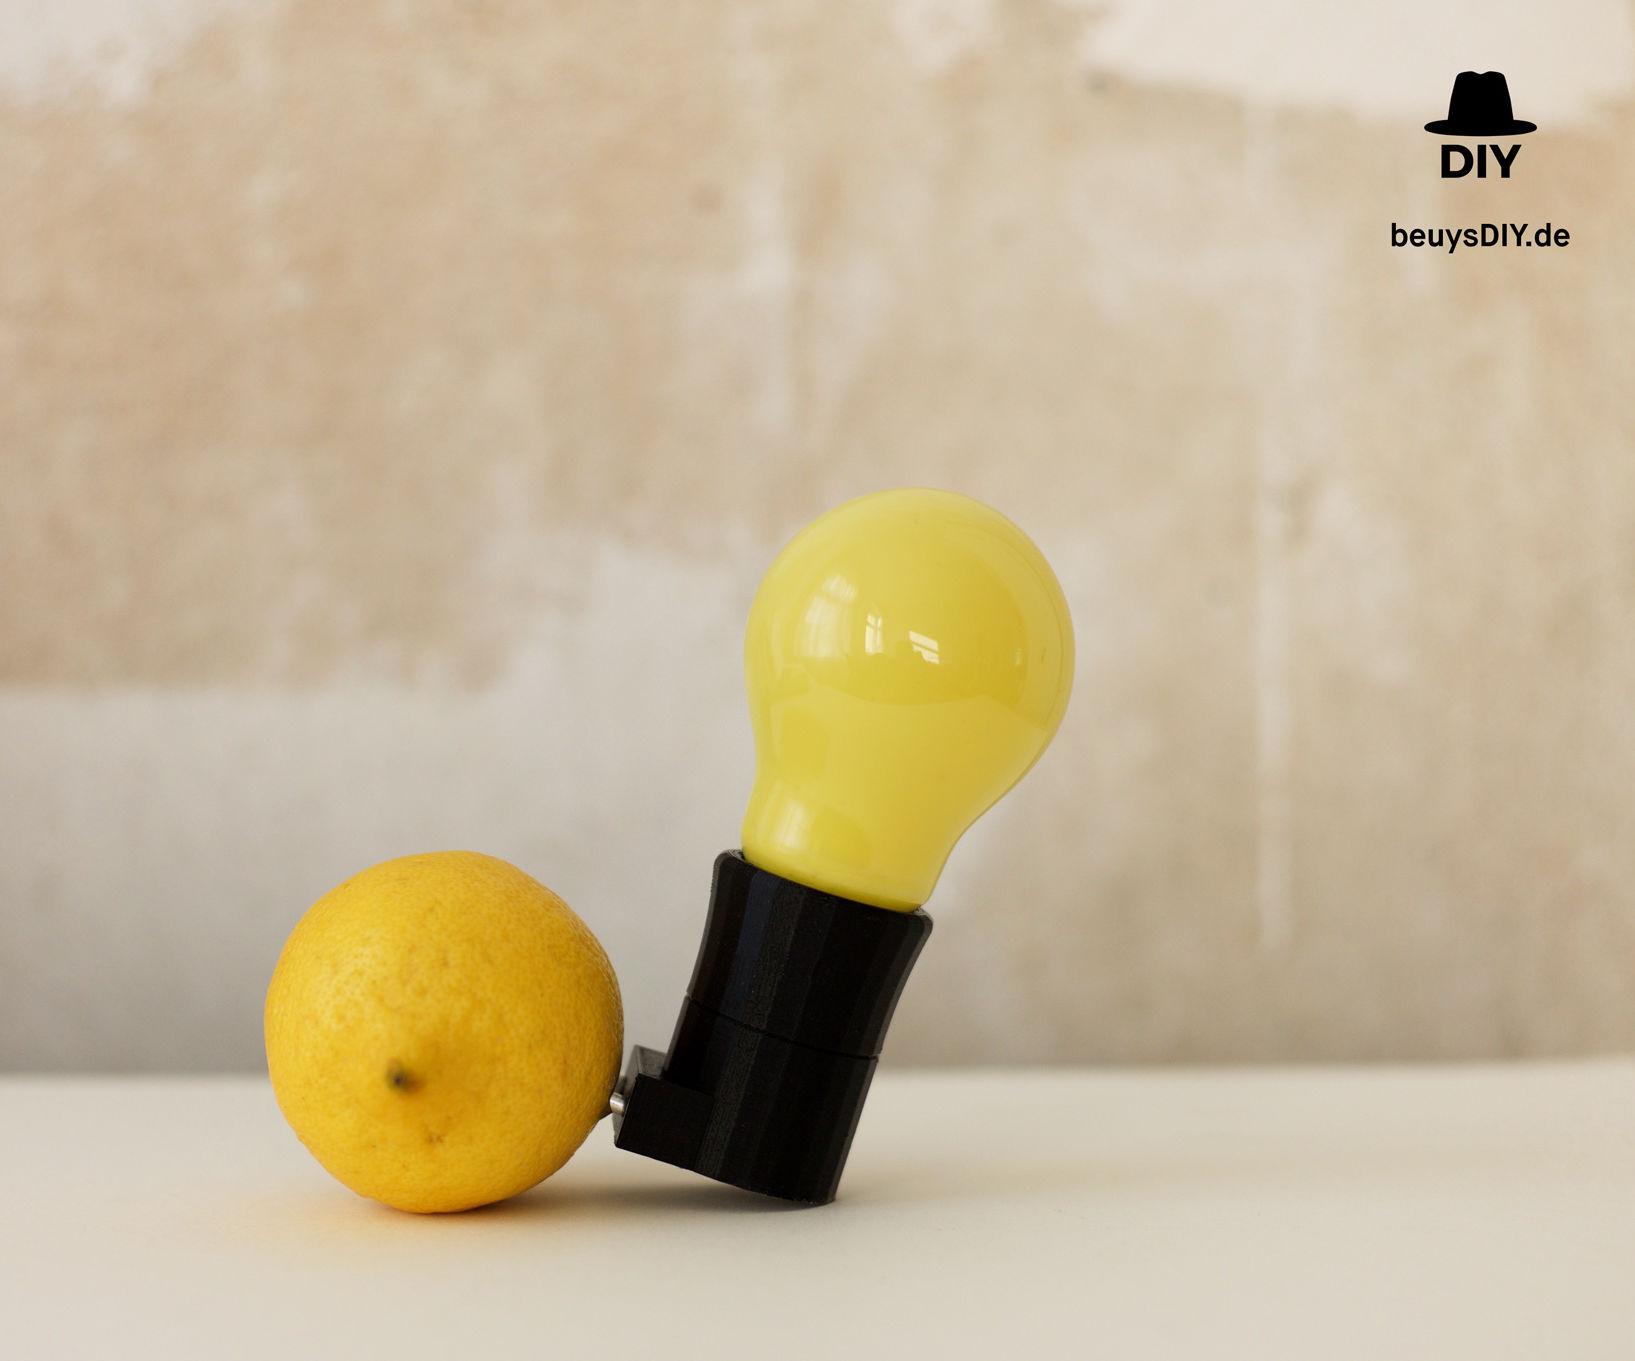 BeuysDIY - Capri-Batterie, Art Piece